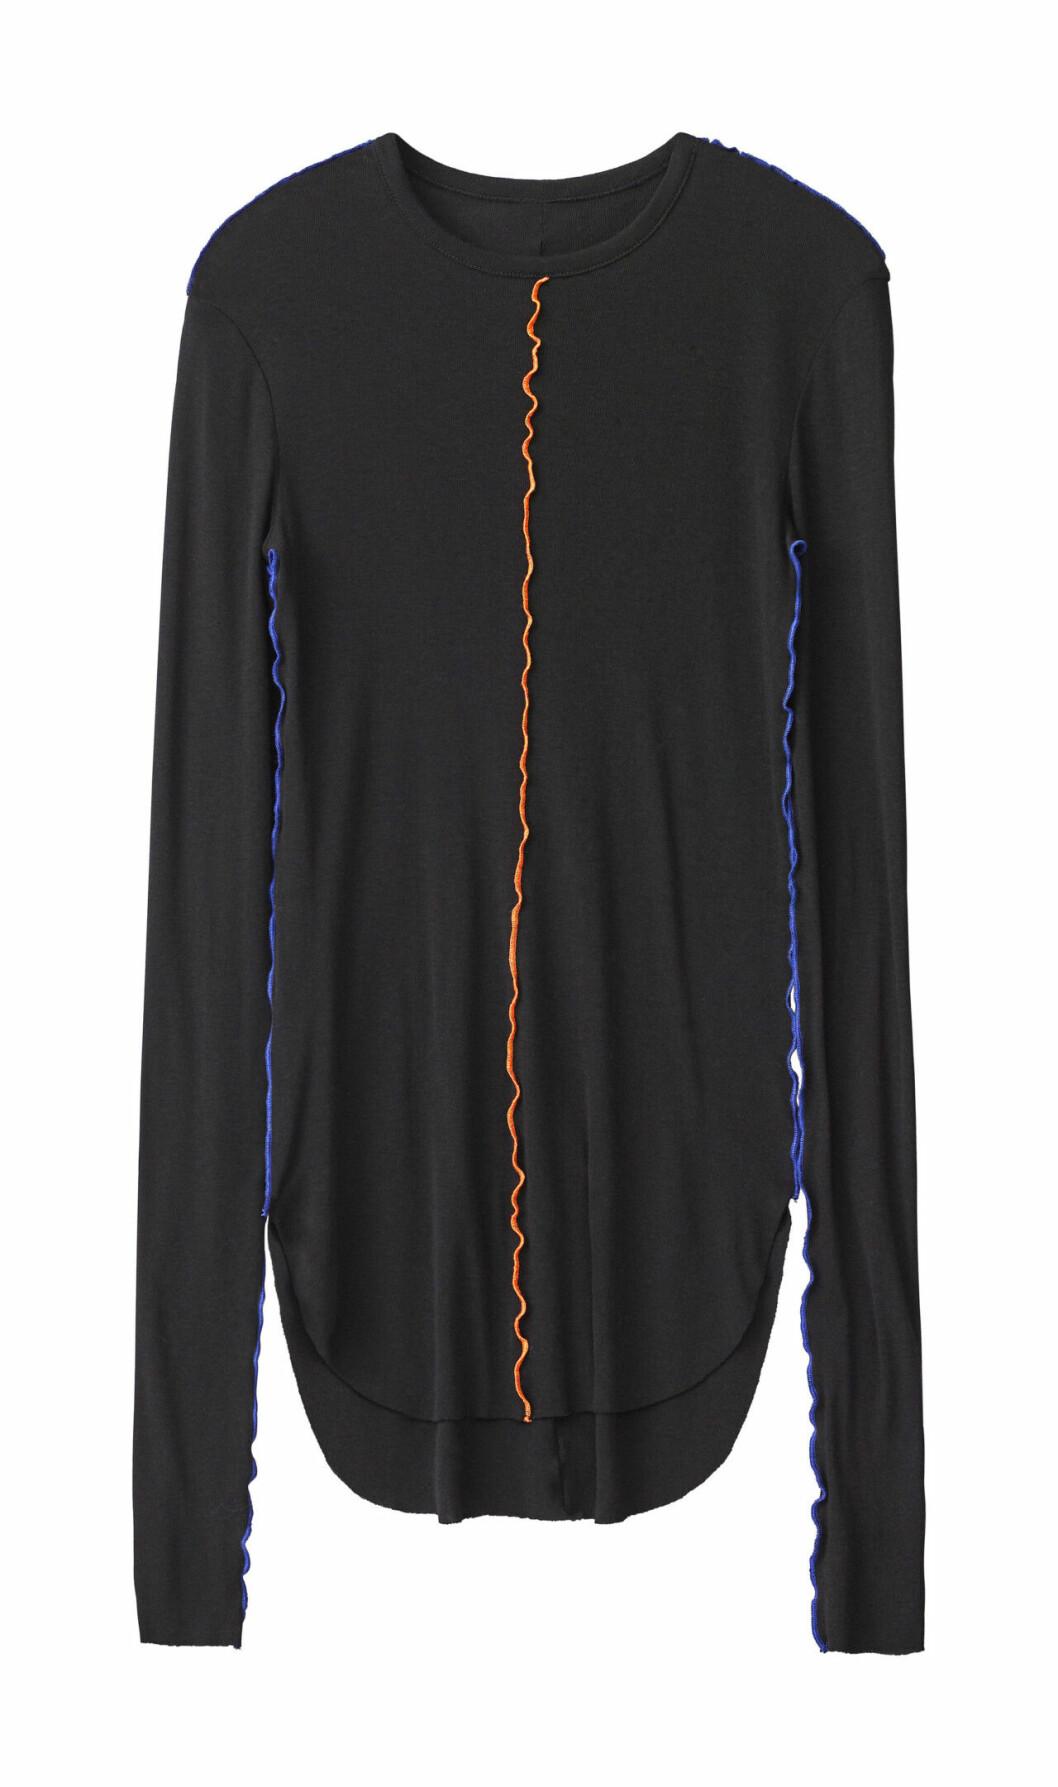 H&M Studio höstkollektion aw 2019 – svart tröja